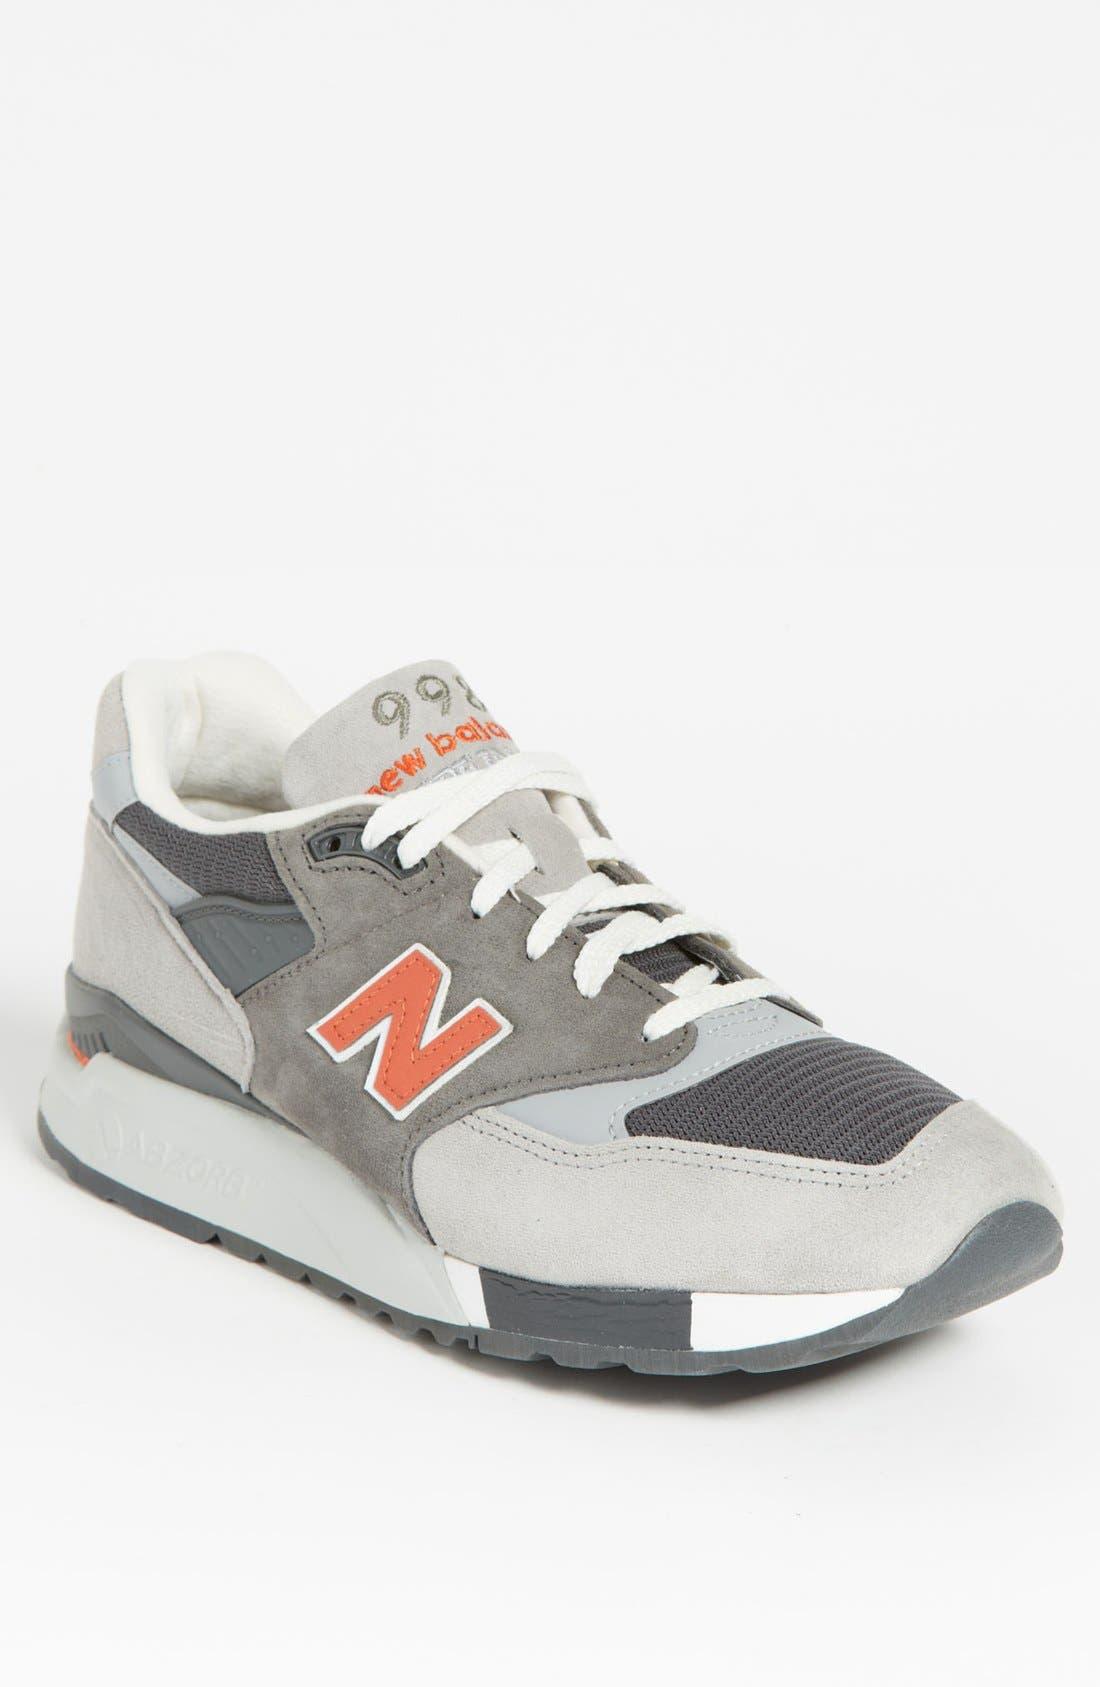 Alternate Image 1 Selected - New Balance '998' Sneaker (Men)